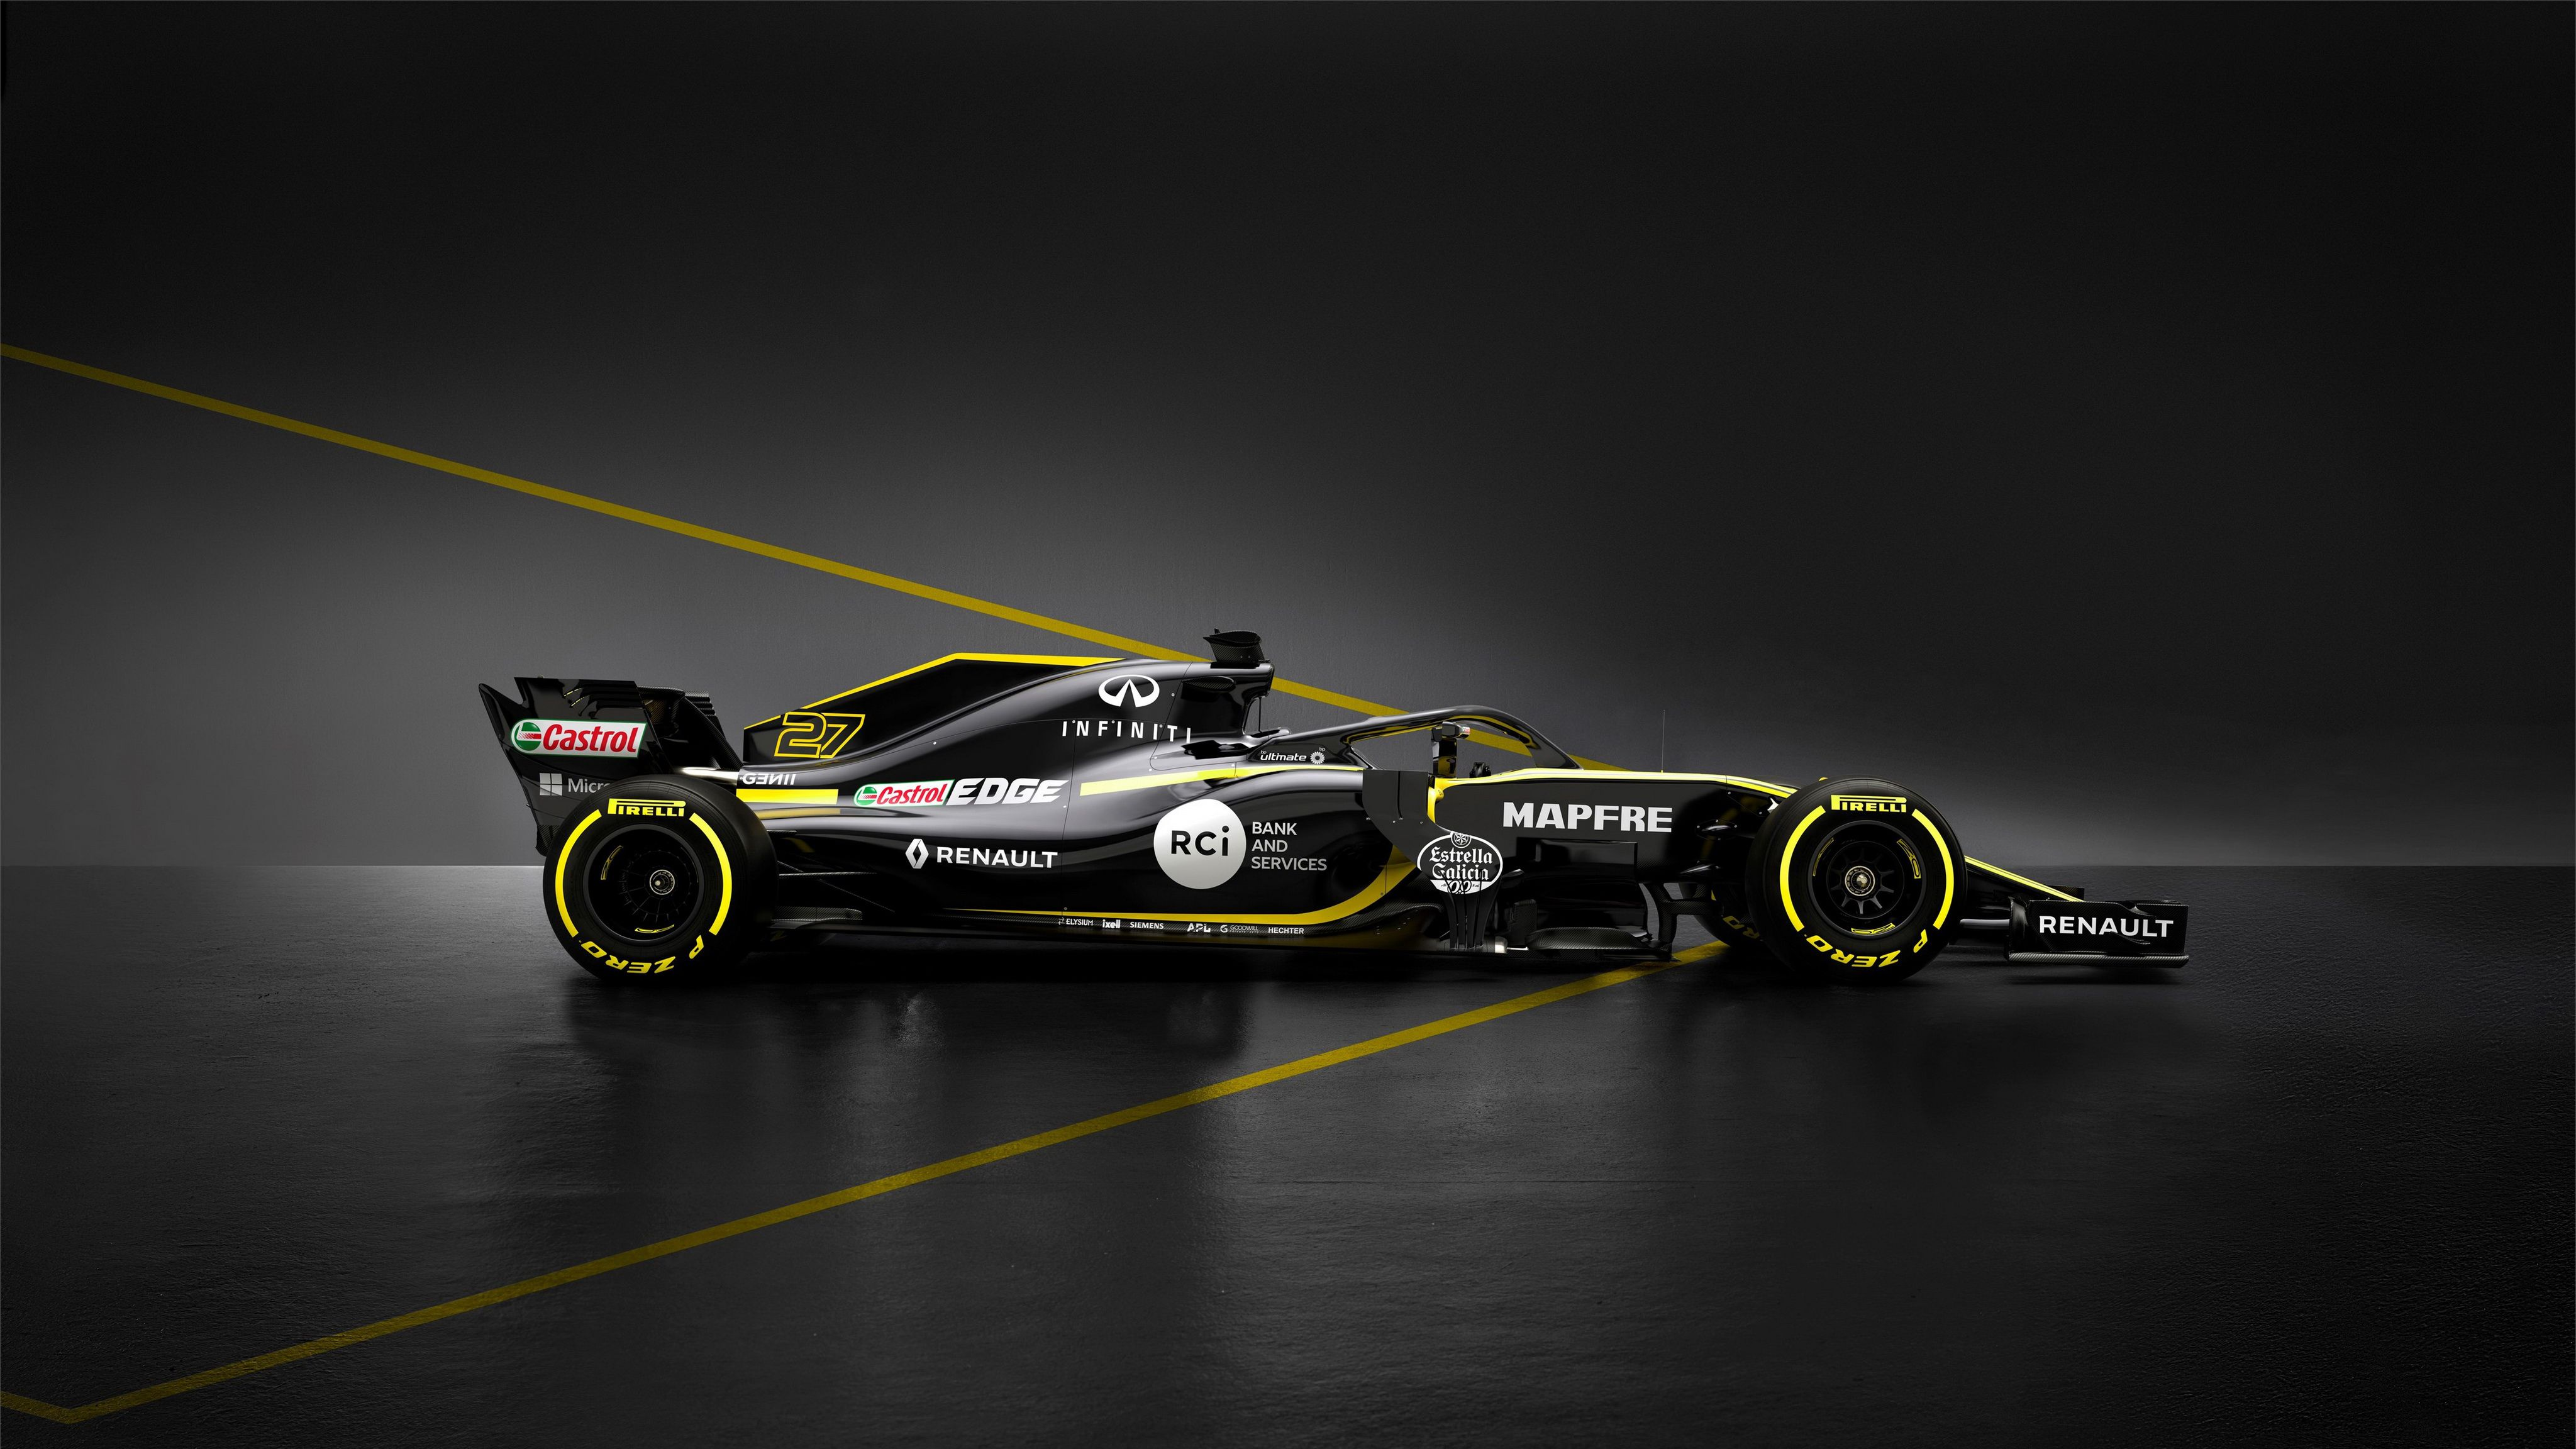 Mercedes Gp Formula 1 4k Hd Desktop Wallpaper For 4k Ultra